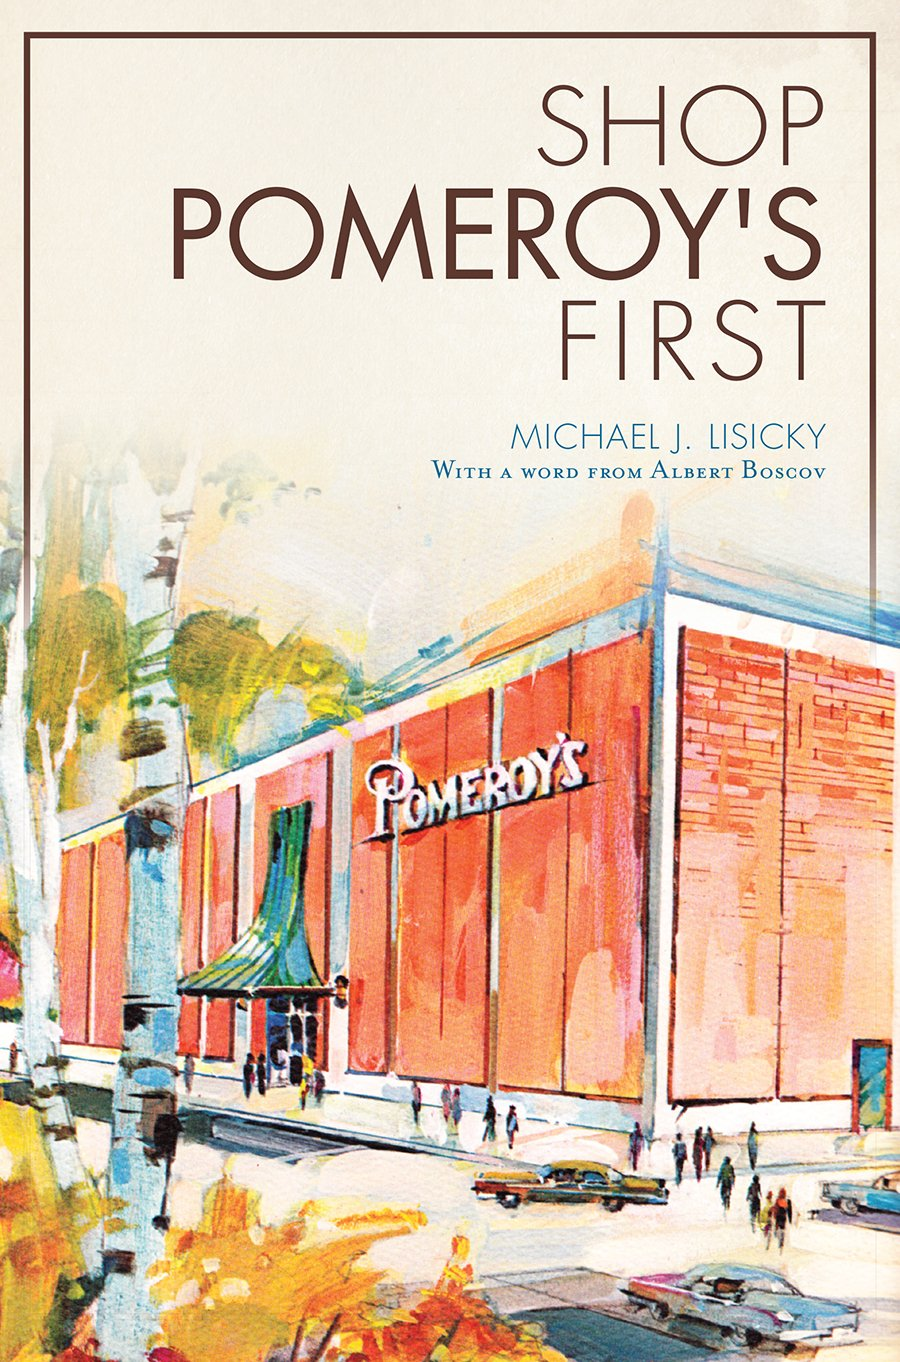 SHOP POMEROY'S FIRST (Landmarks)